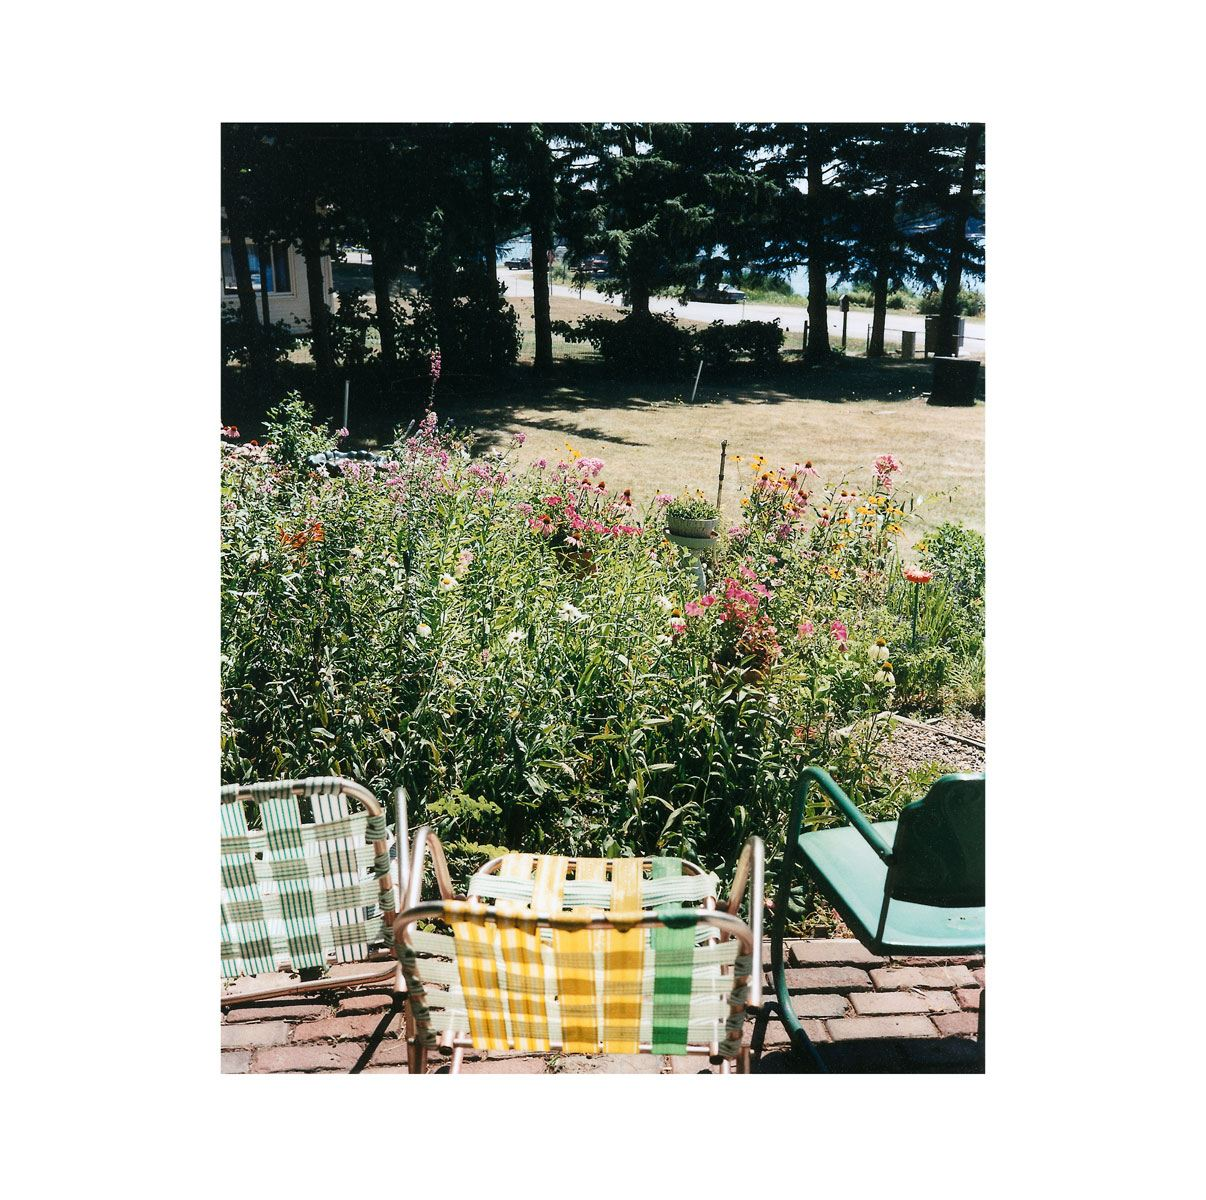 """Lawn Chairs"" | Village Portrait | Pentwater, Michigan, USA | 1996"